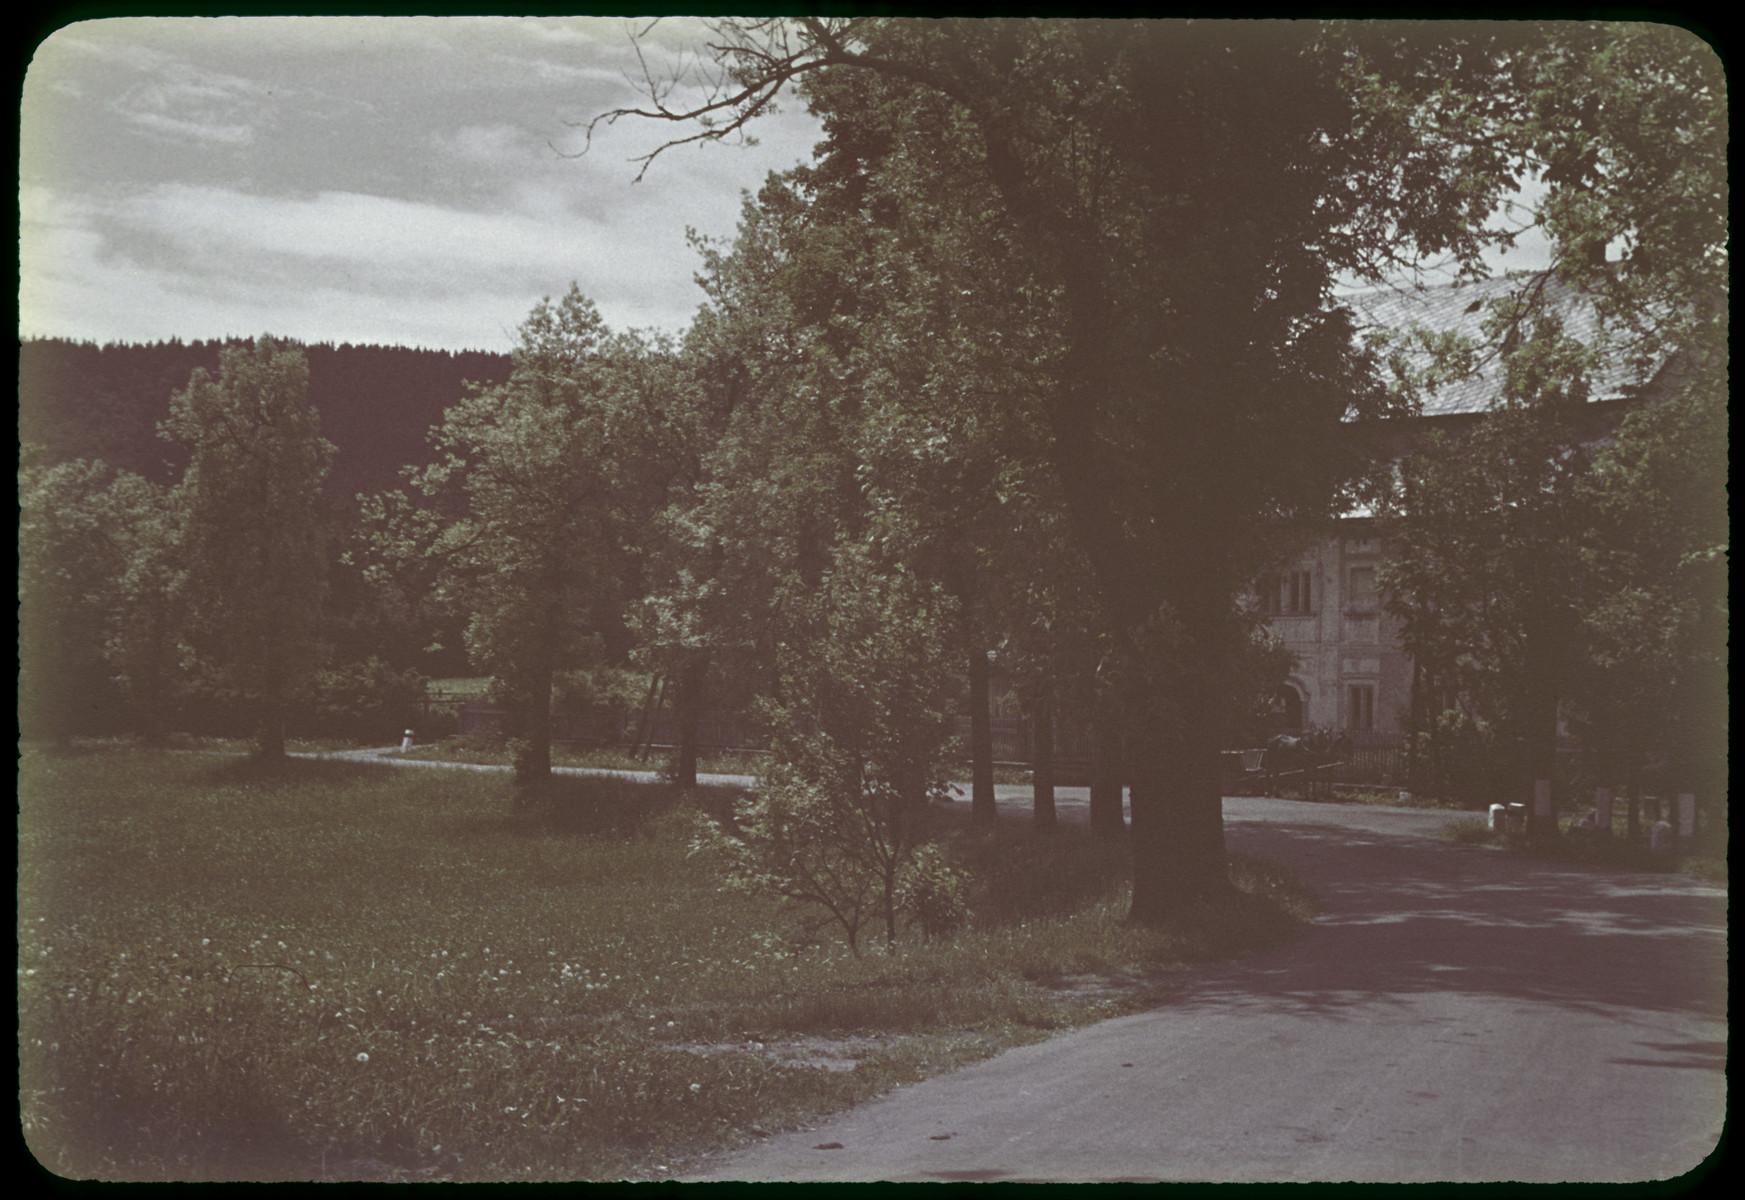 Postwar view of a tuberculosis sanatorium, [probably in Brest].